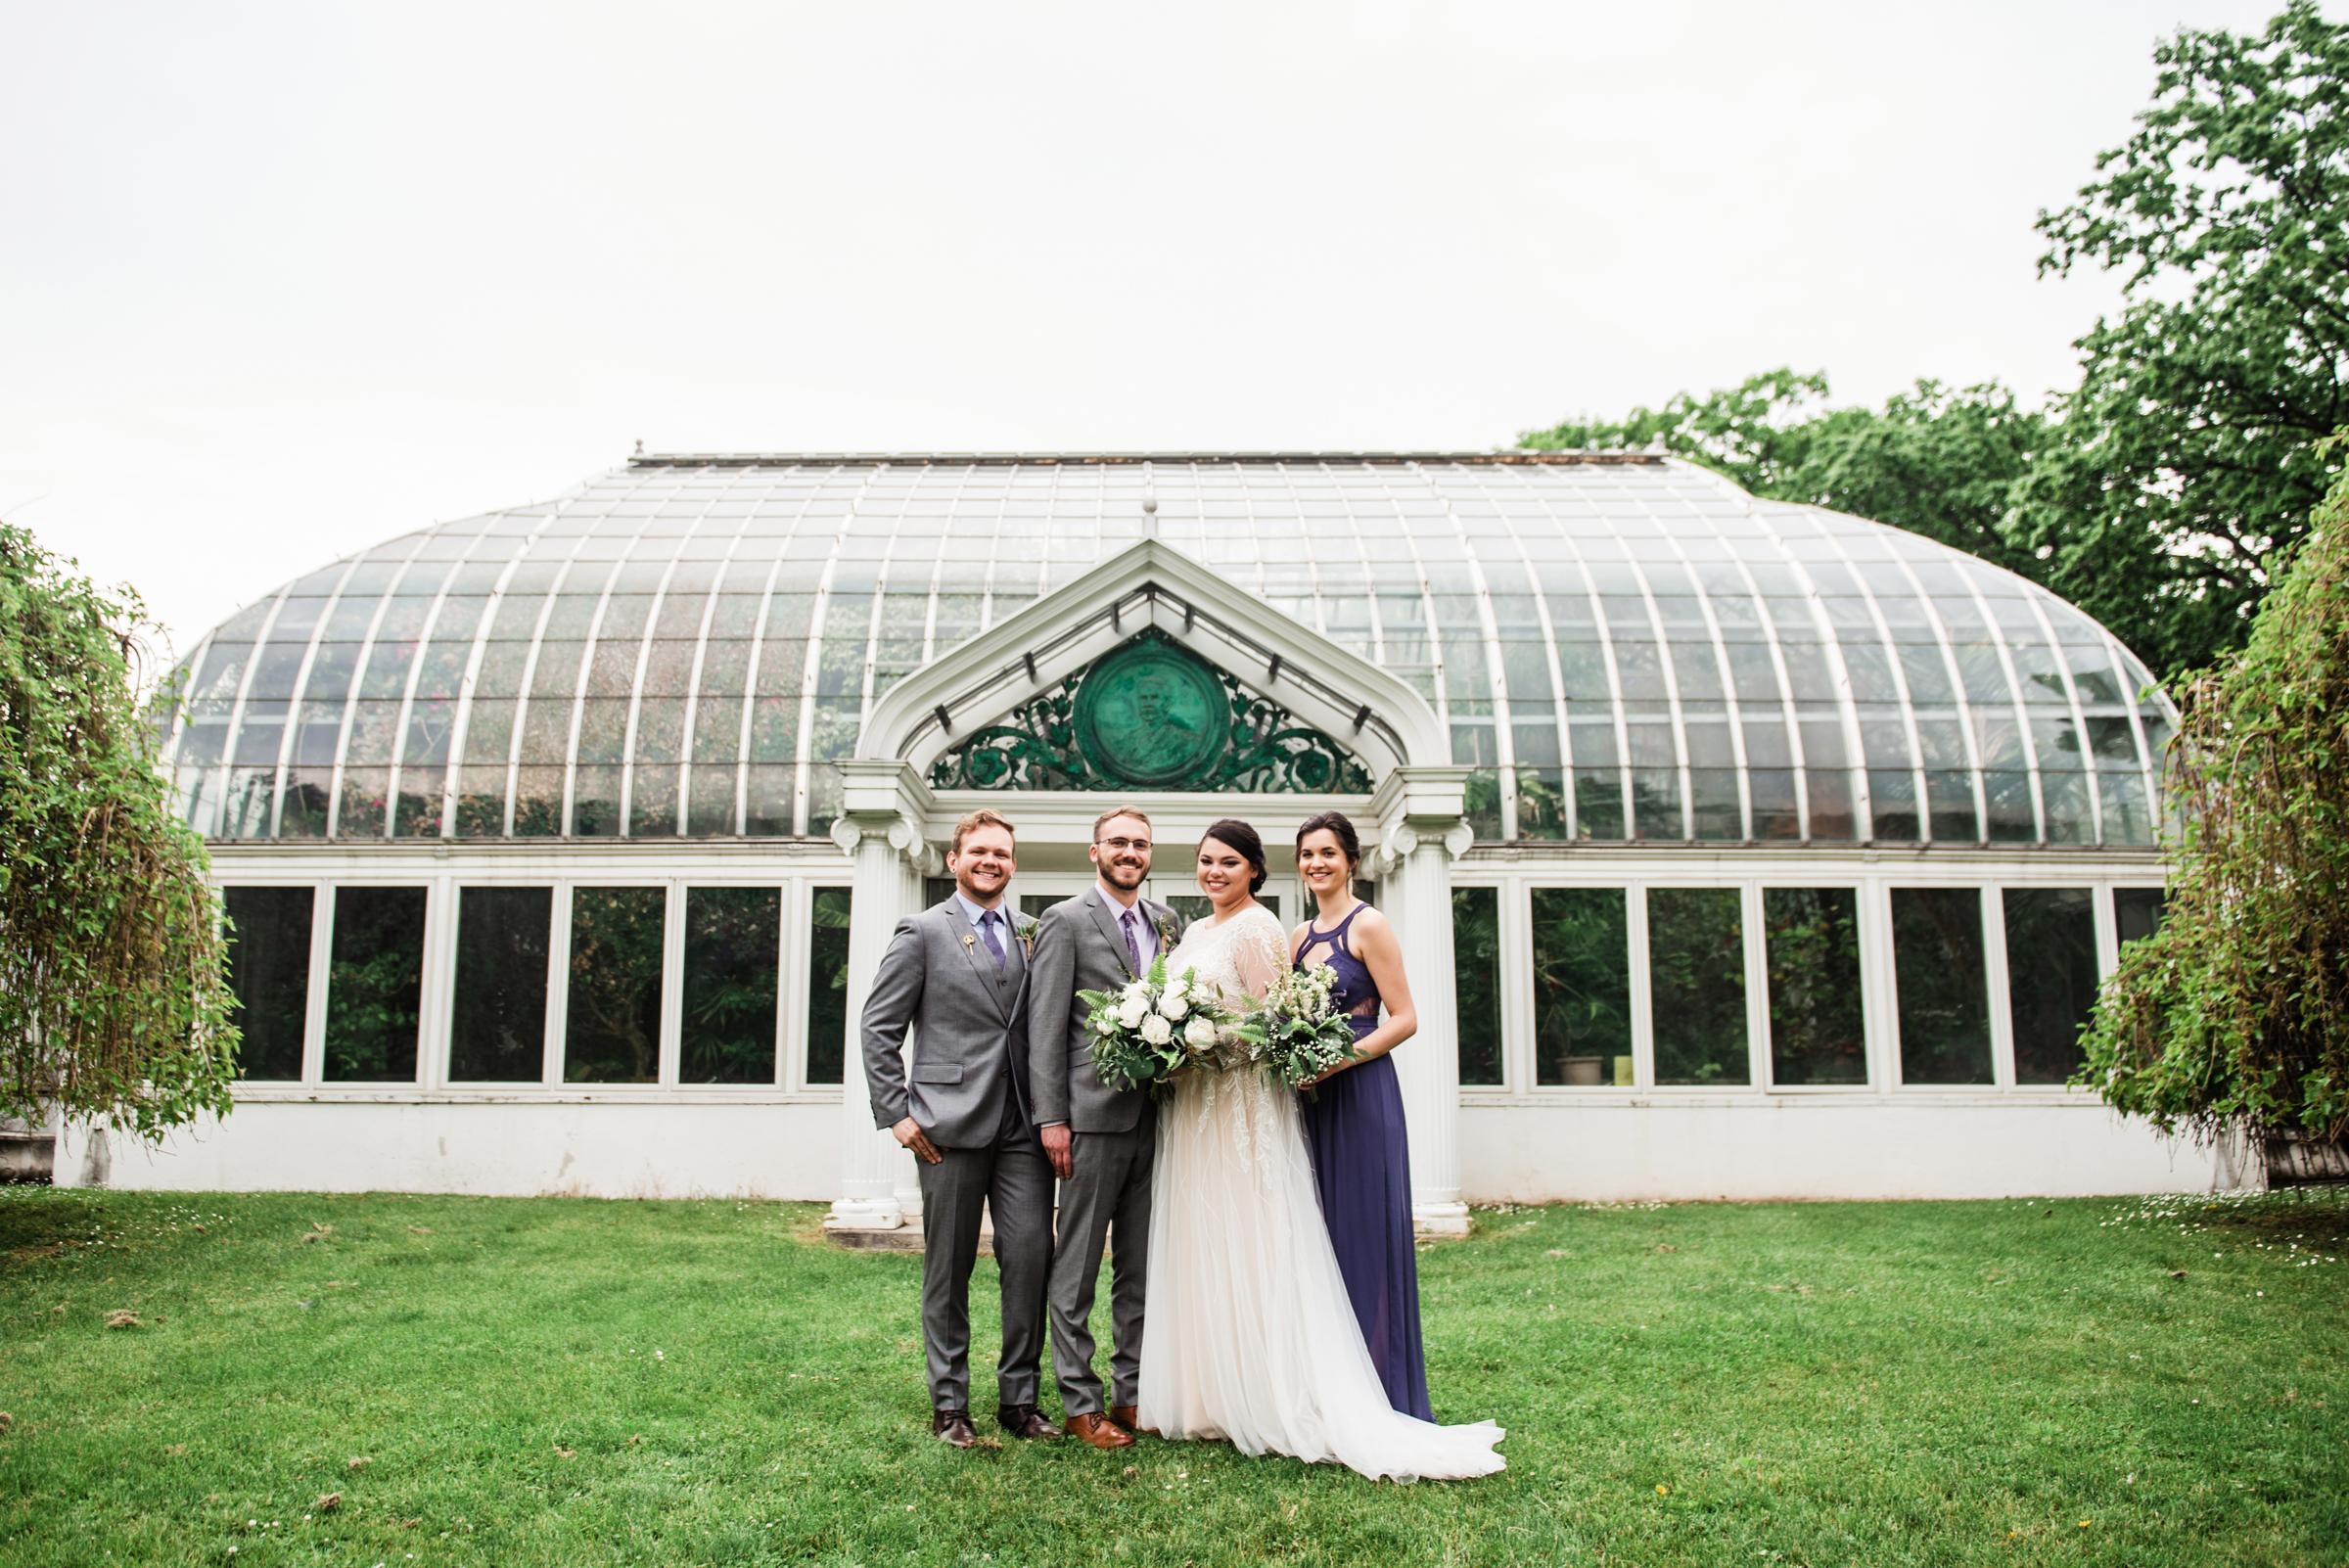 Studio_180_Lamberton_Conservatory_Rochester_Wedding_JILL_STUDIO_Rochester_NY_Photographer_DSC_8745.jpg